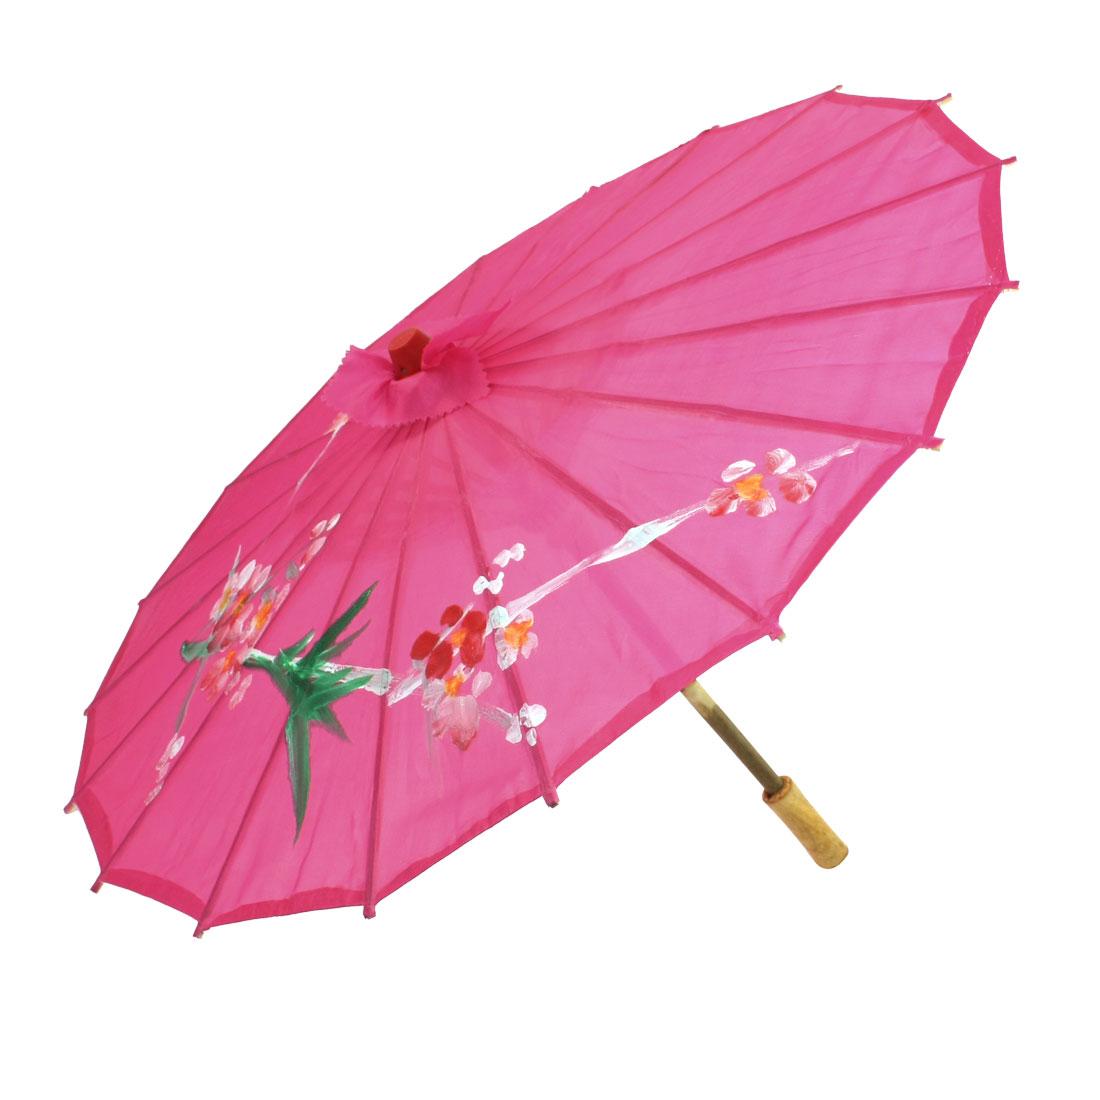 57cm Wooden Handle Plum Blossom Bamboo Folded Fuchsia Chinese Umbrella